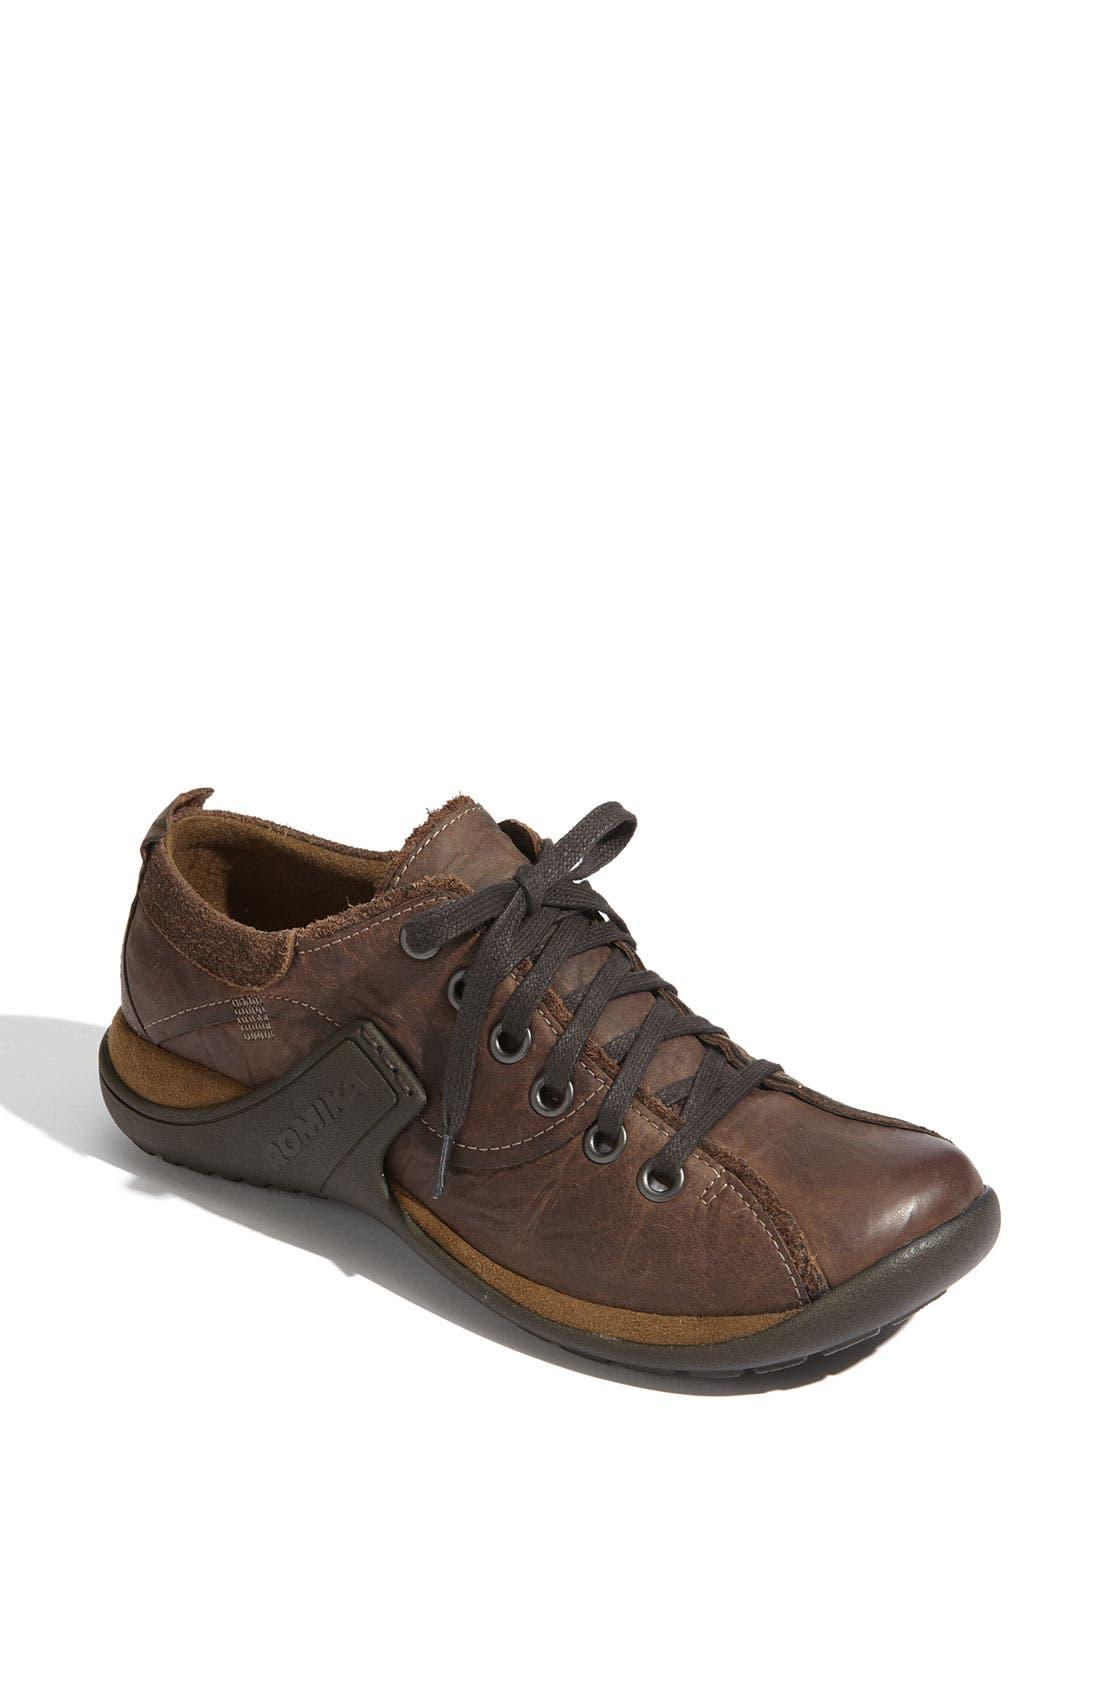 Alternate Image 1 Selected - Romika® 'Milla 62' Sneaker